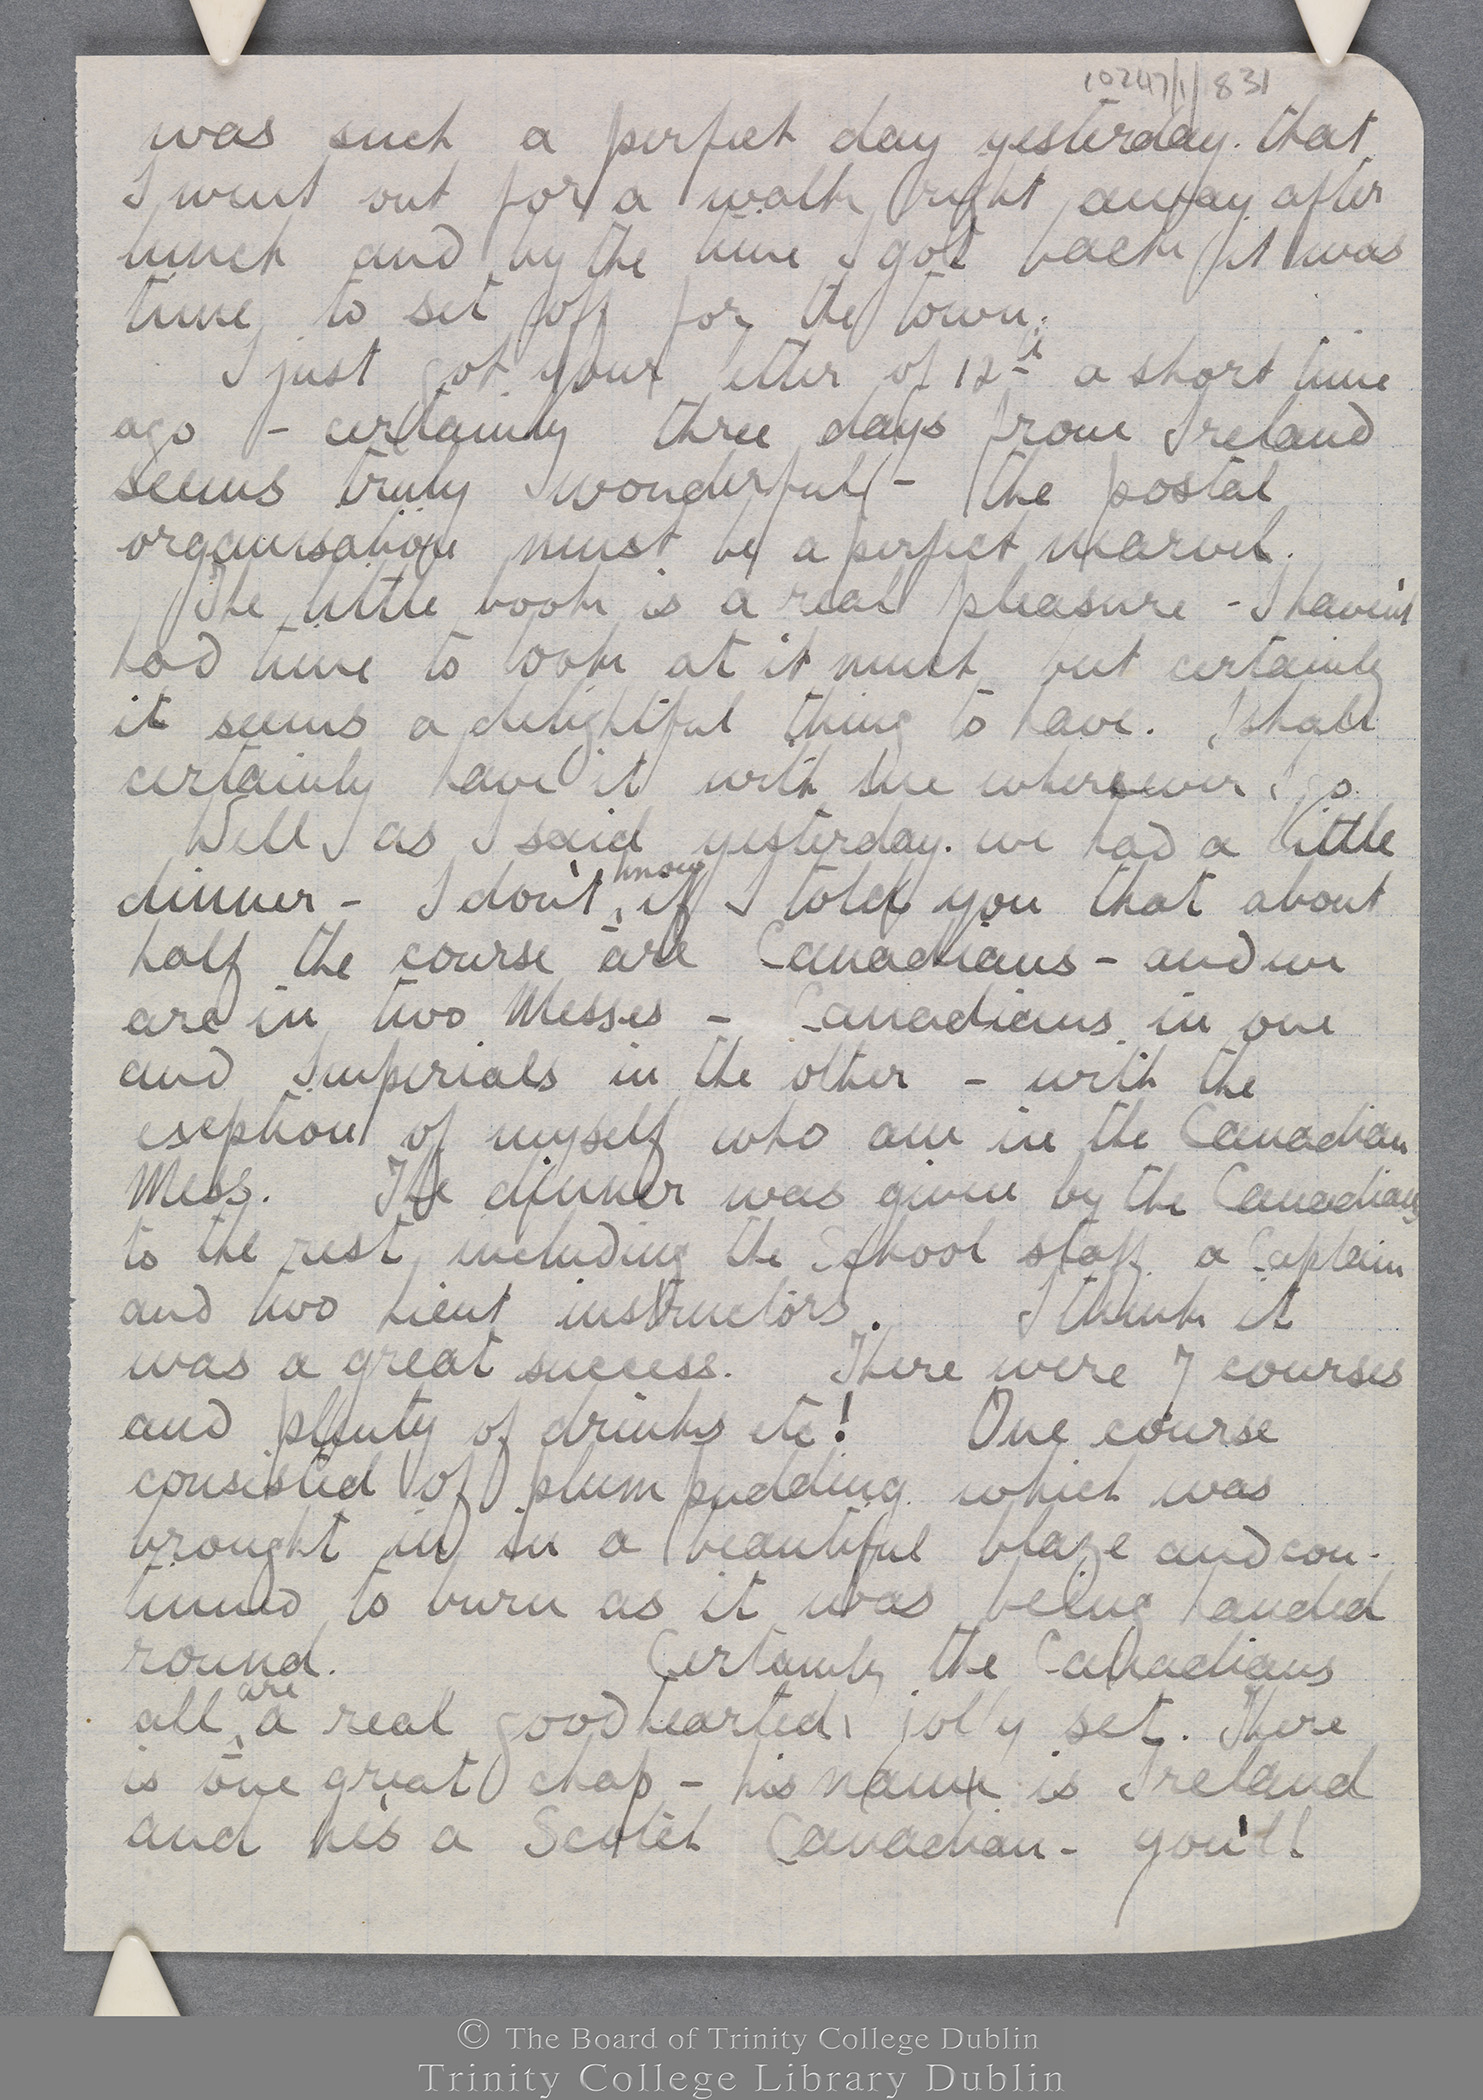 TCD MS 10247/1/831 folio 5 recto